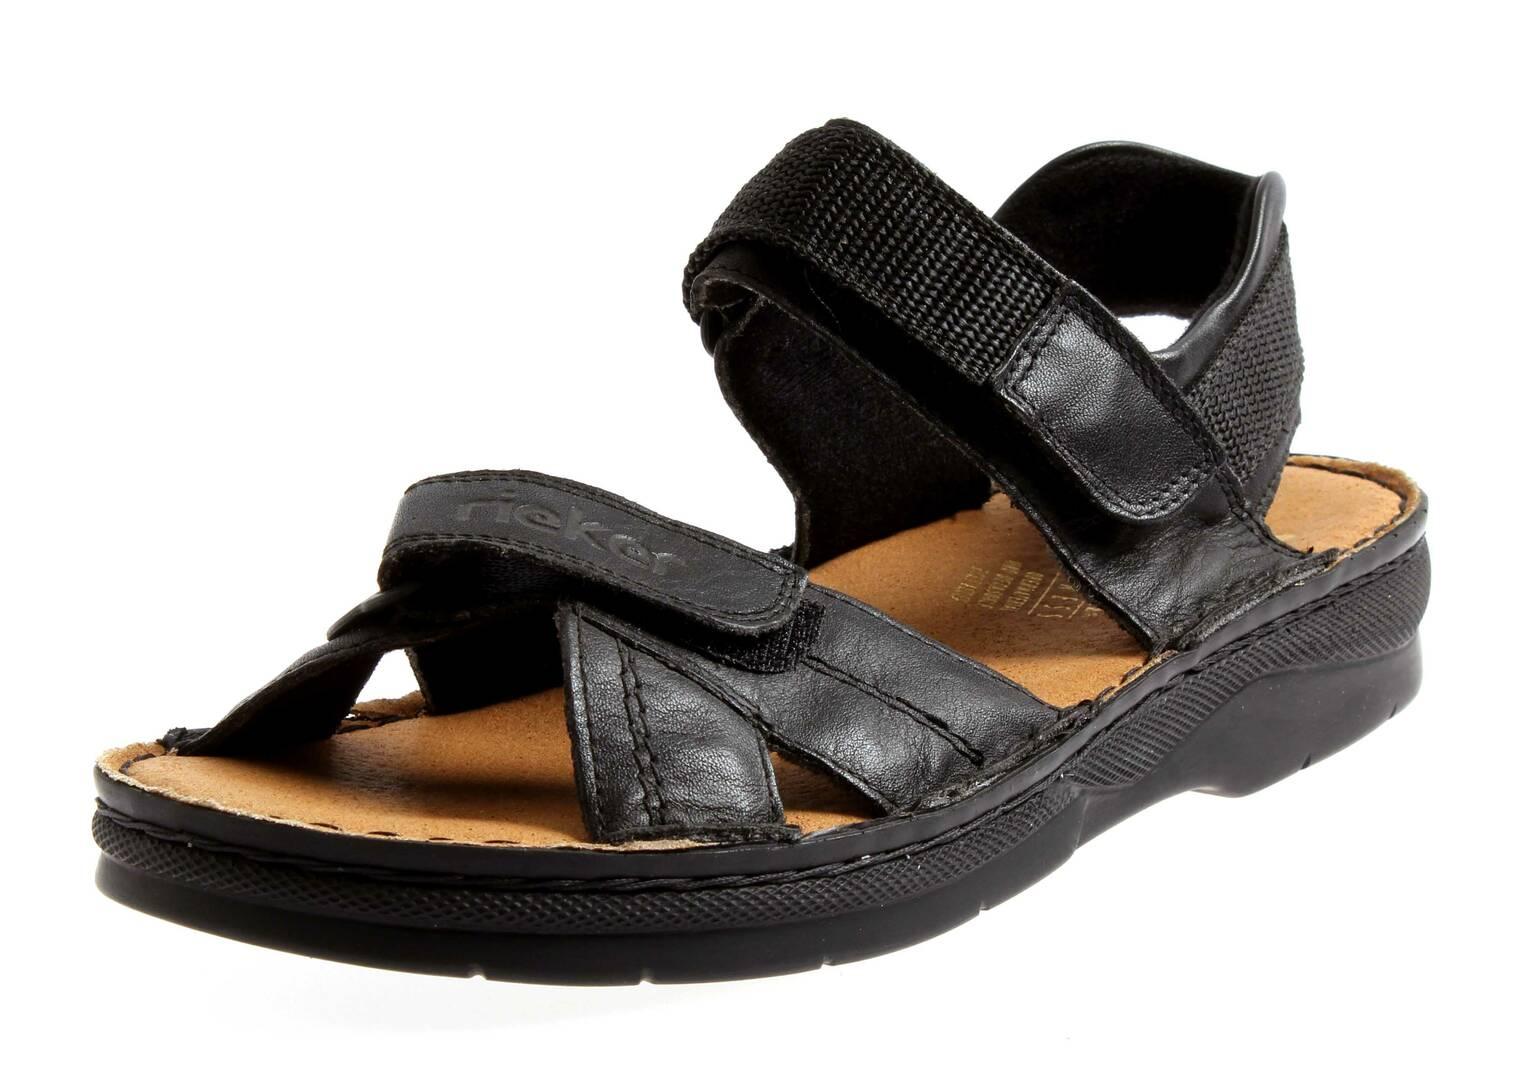 rieker sandalen lucy damenschuhe sommerschuhe 63551 trekkingsandale creme black ebay. Black Bedroom Furniture Sets. Home Design Ideas